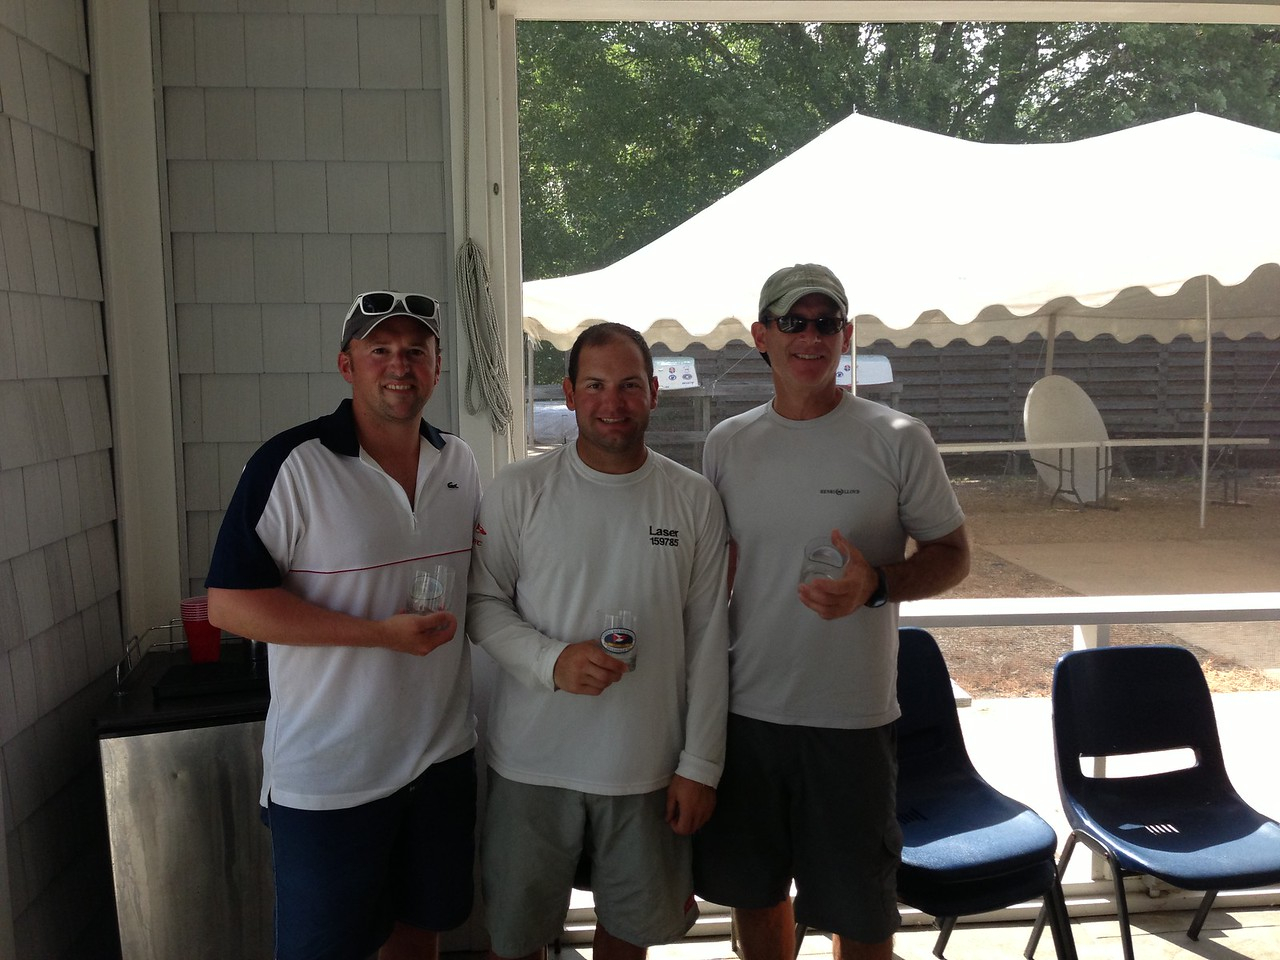 2/28 FBYC Laser Summer Regatta  Blake, Jon, Len